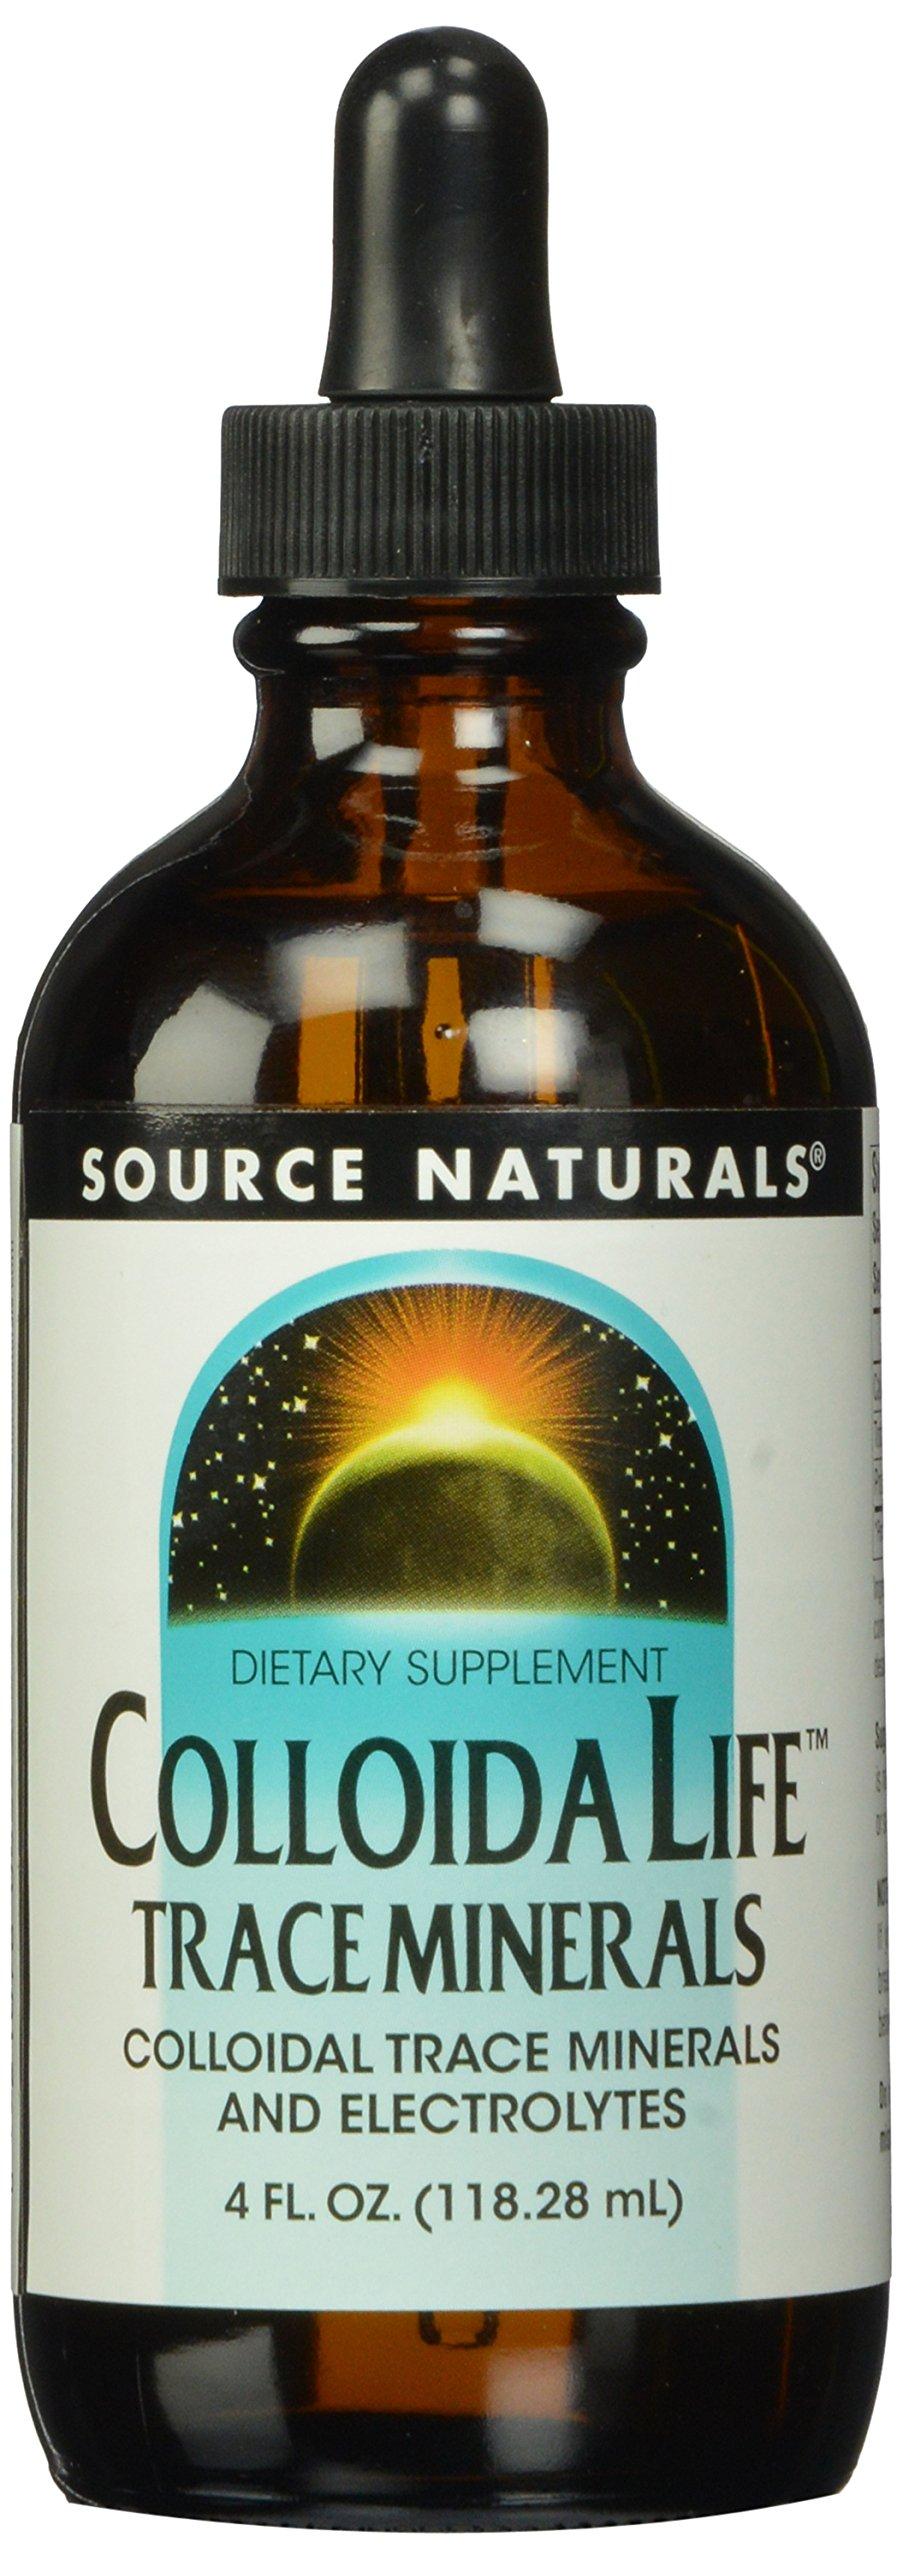 Source Naturals Colloida Life Trace Minerals Collidal Trace Minerals & Electrolytes - Dietary Supplement - Pure Source of Calcium, Chromium, Copper, Potassium, Zinc & More - 100% Pure - 4oz